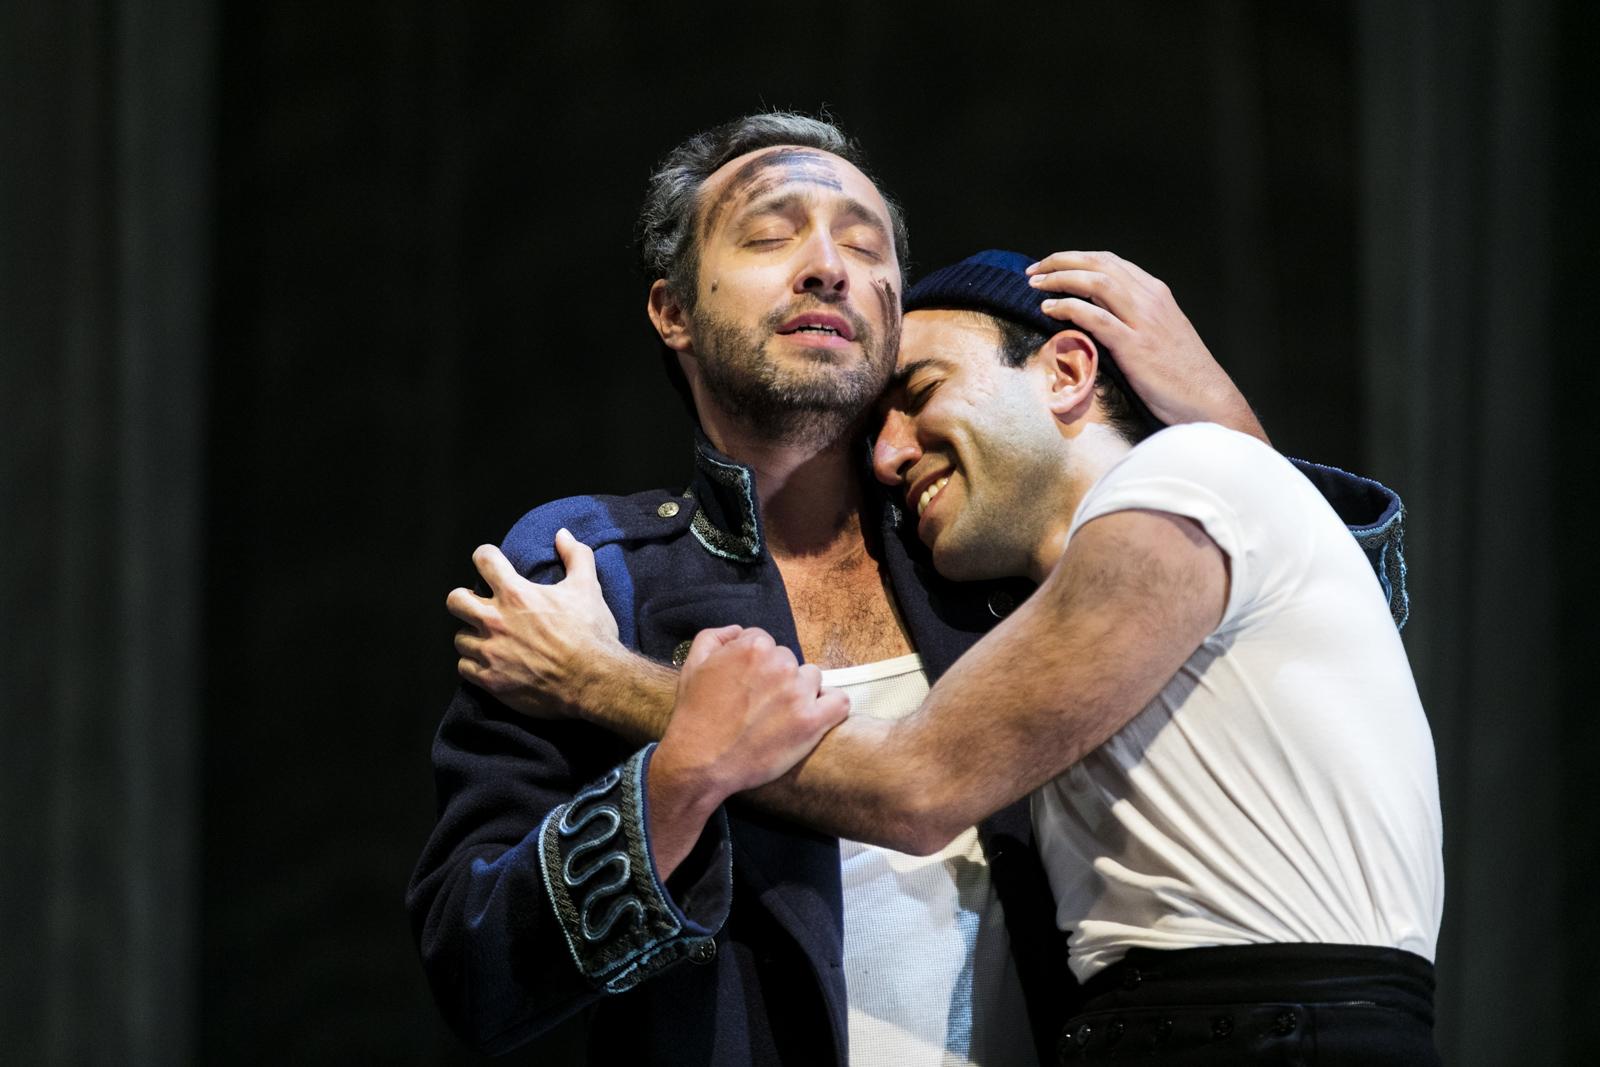 Fernando Guimaraes and Brenton Spiteri